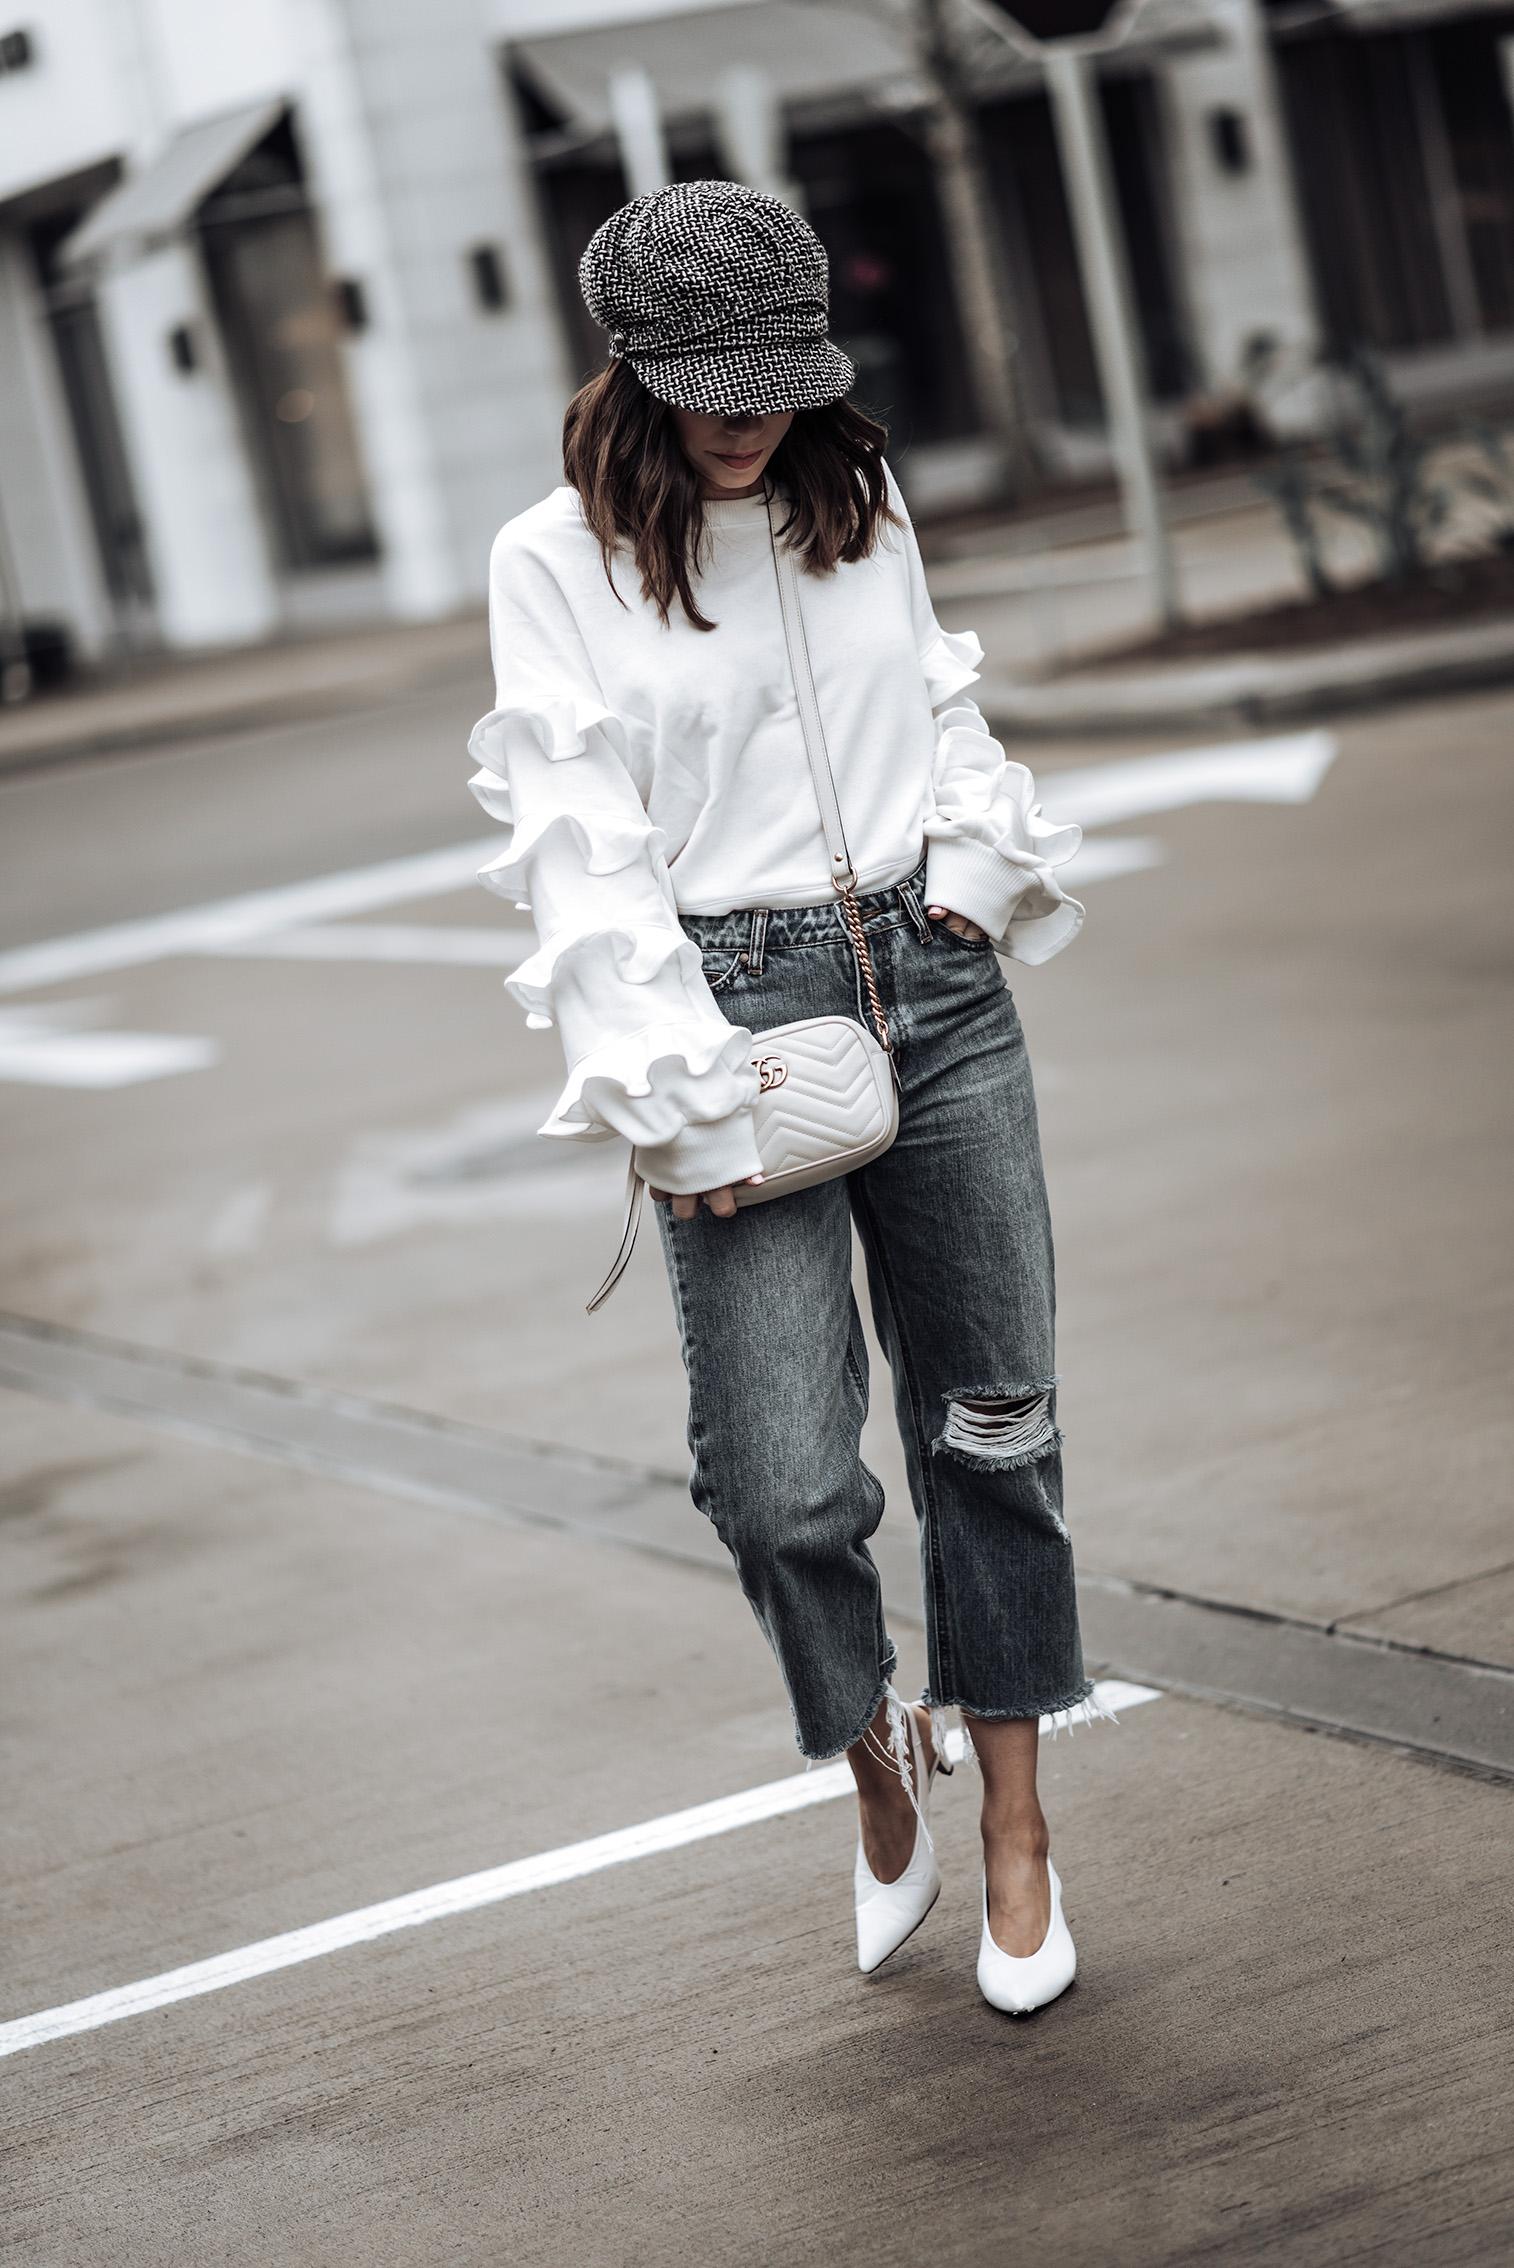 Ruffle details  Ruffle Sleeve Terry Pullover (similar)   Gucci GG Marmont bag   Jeans (similar)   Tweed Baker's Boy Cap   White Slingback Heels #bakerhat #liketkit #slingbackheels #streetstyle